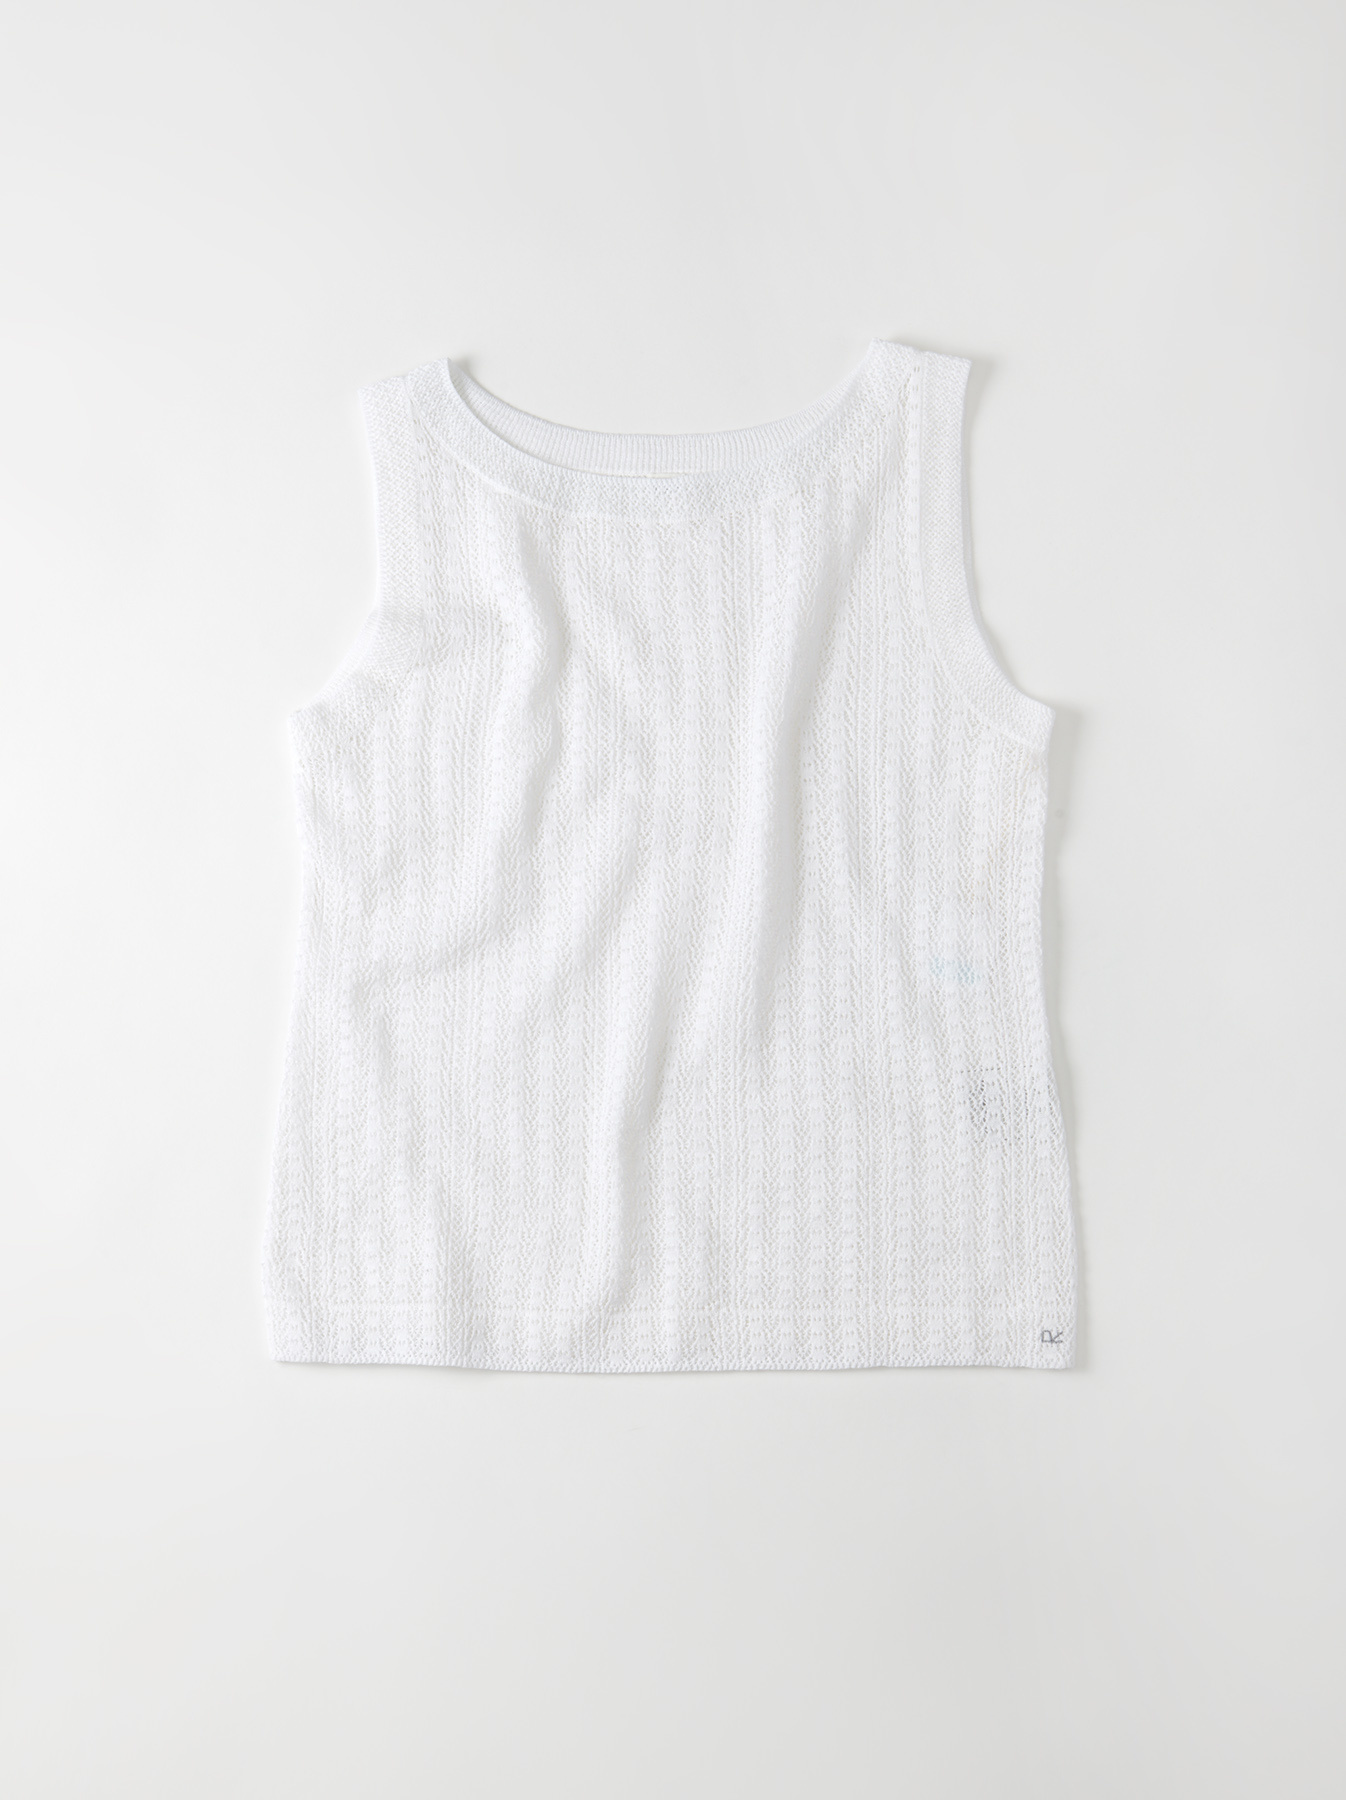 WH Gima Knit Lace Sleeveless Top-1